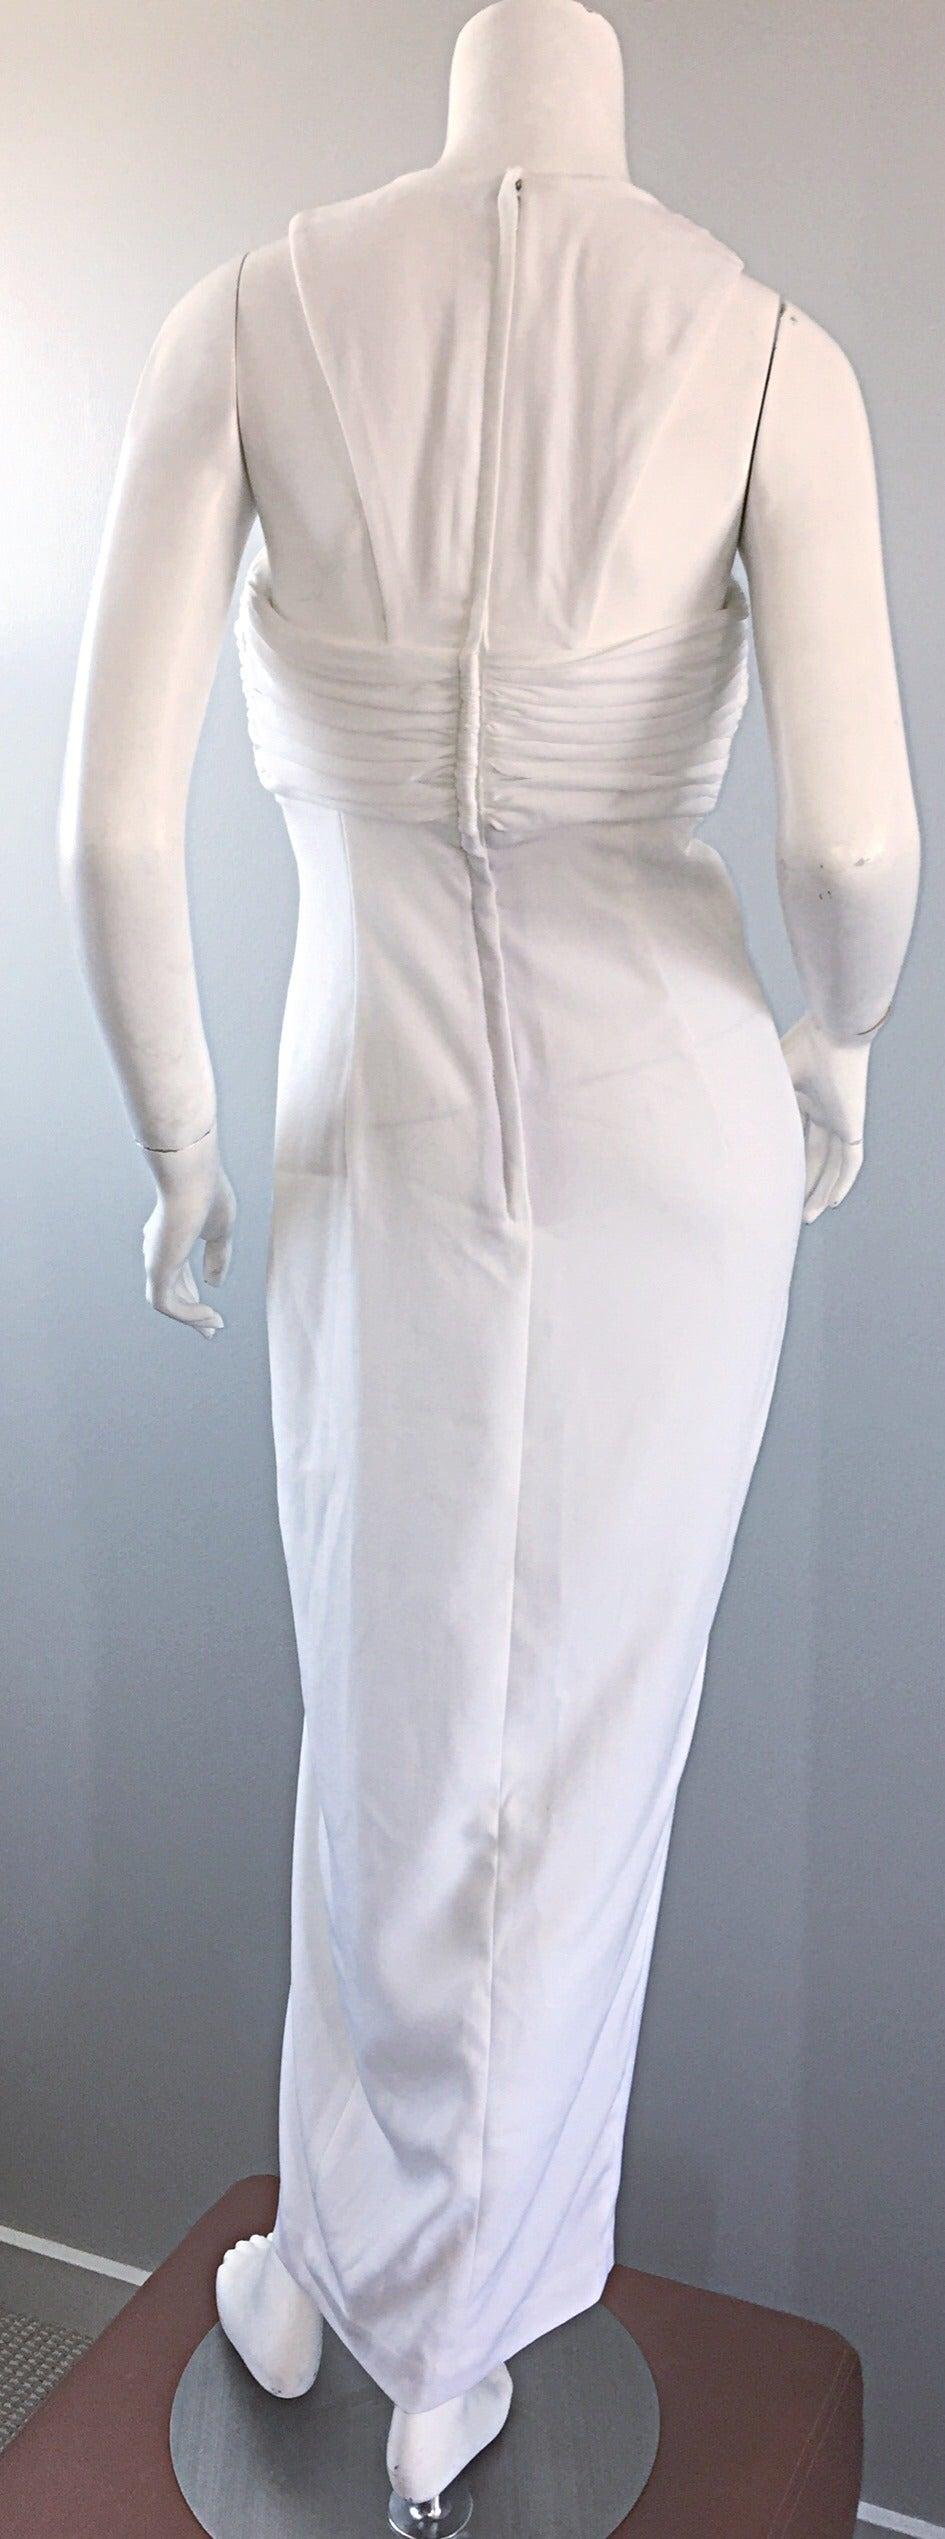 1990s Vintage Tadashi Shoji White 90s Grecian Dress w/ Rhinestones + Pearl For Sale 3